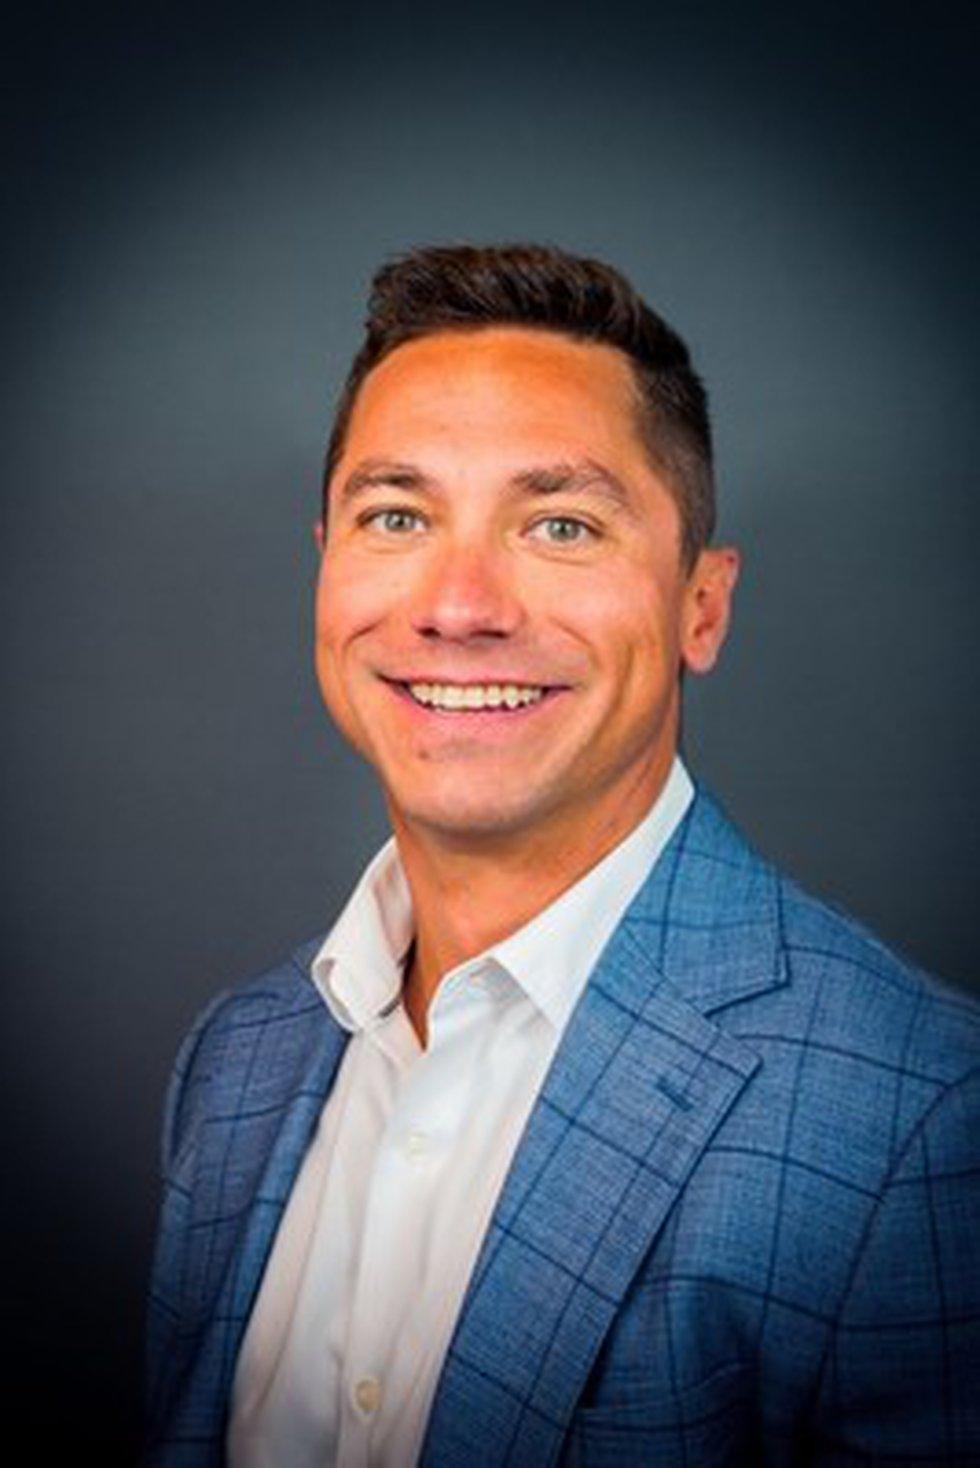 Ryan Morrill, Municipal Finance Relationship Manager for Vectra Bank Colorado